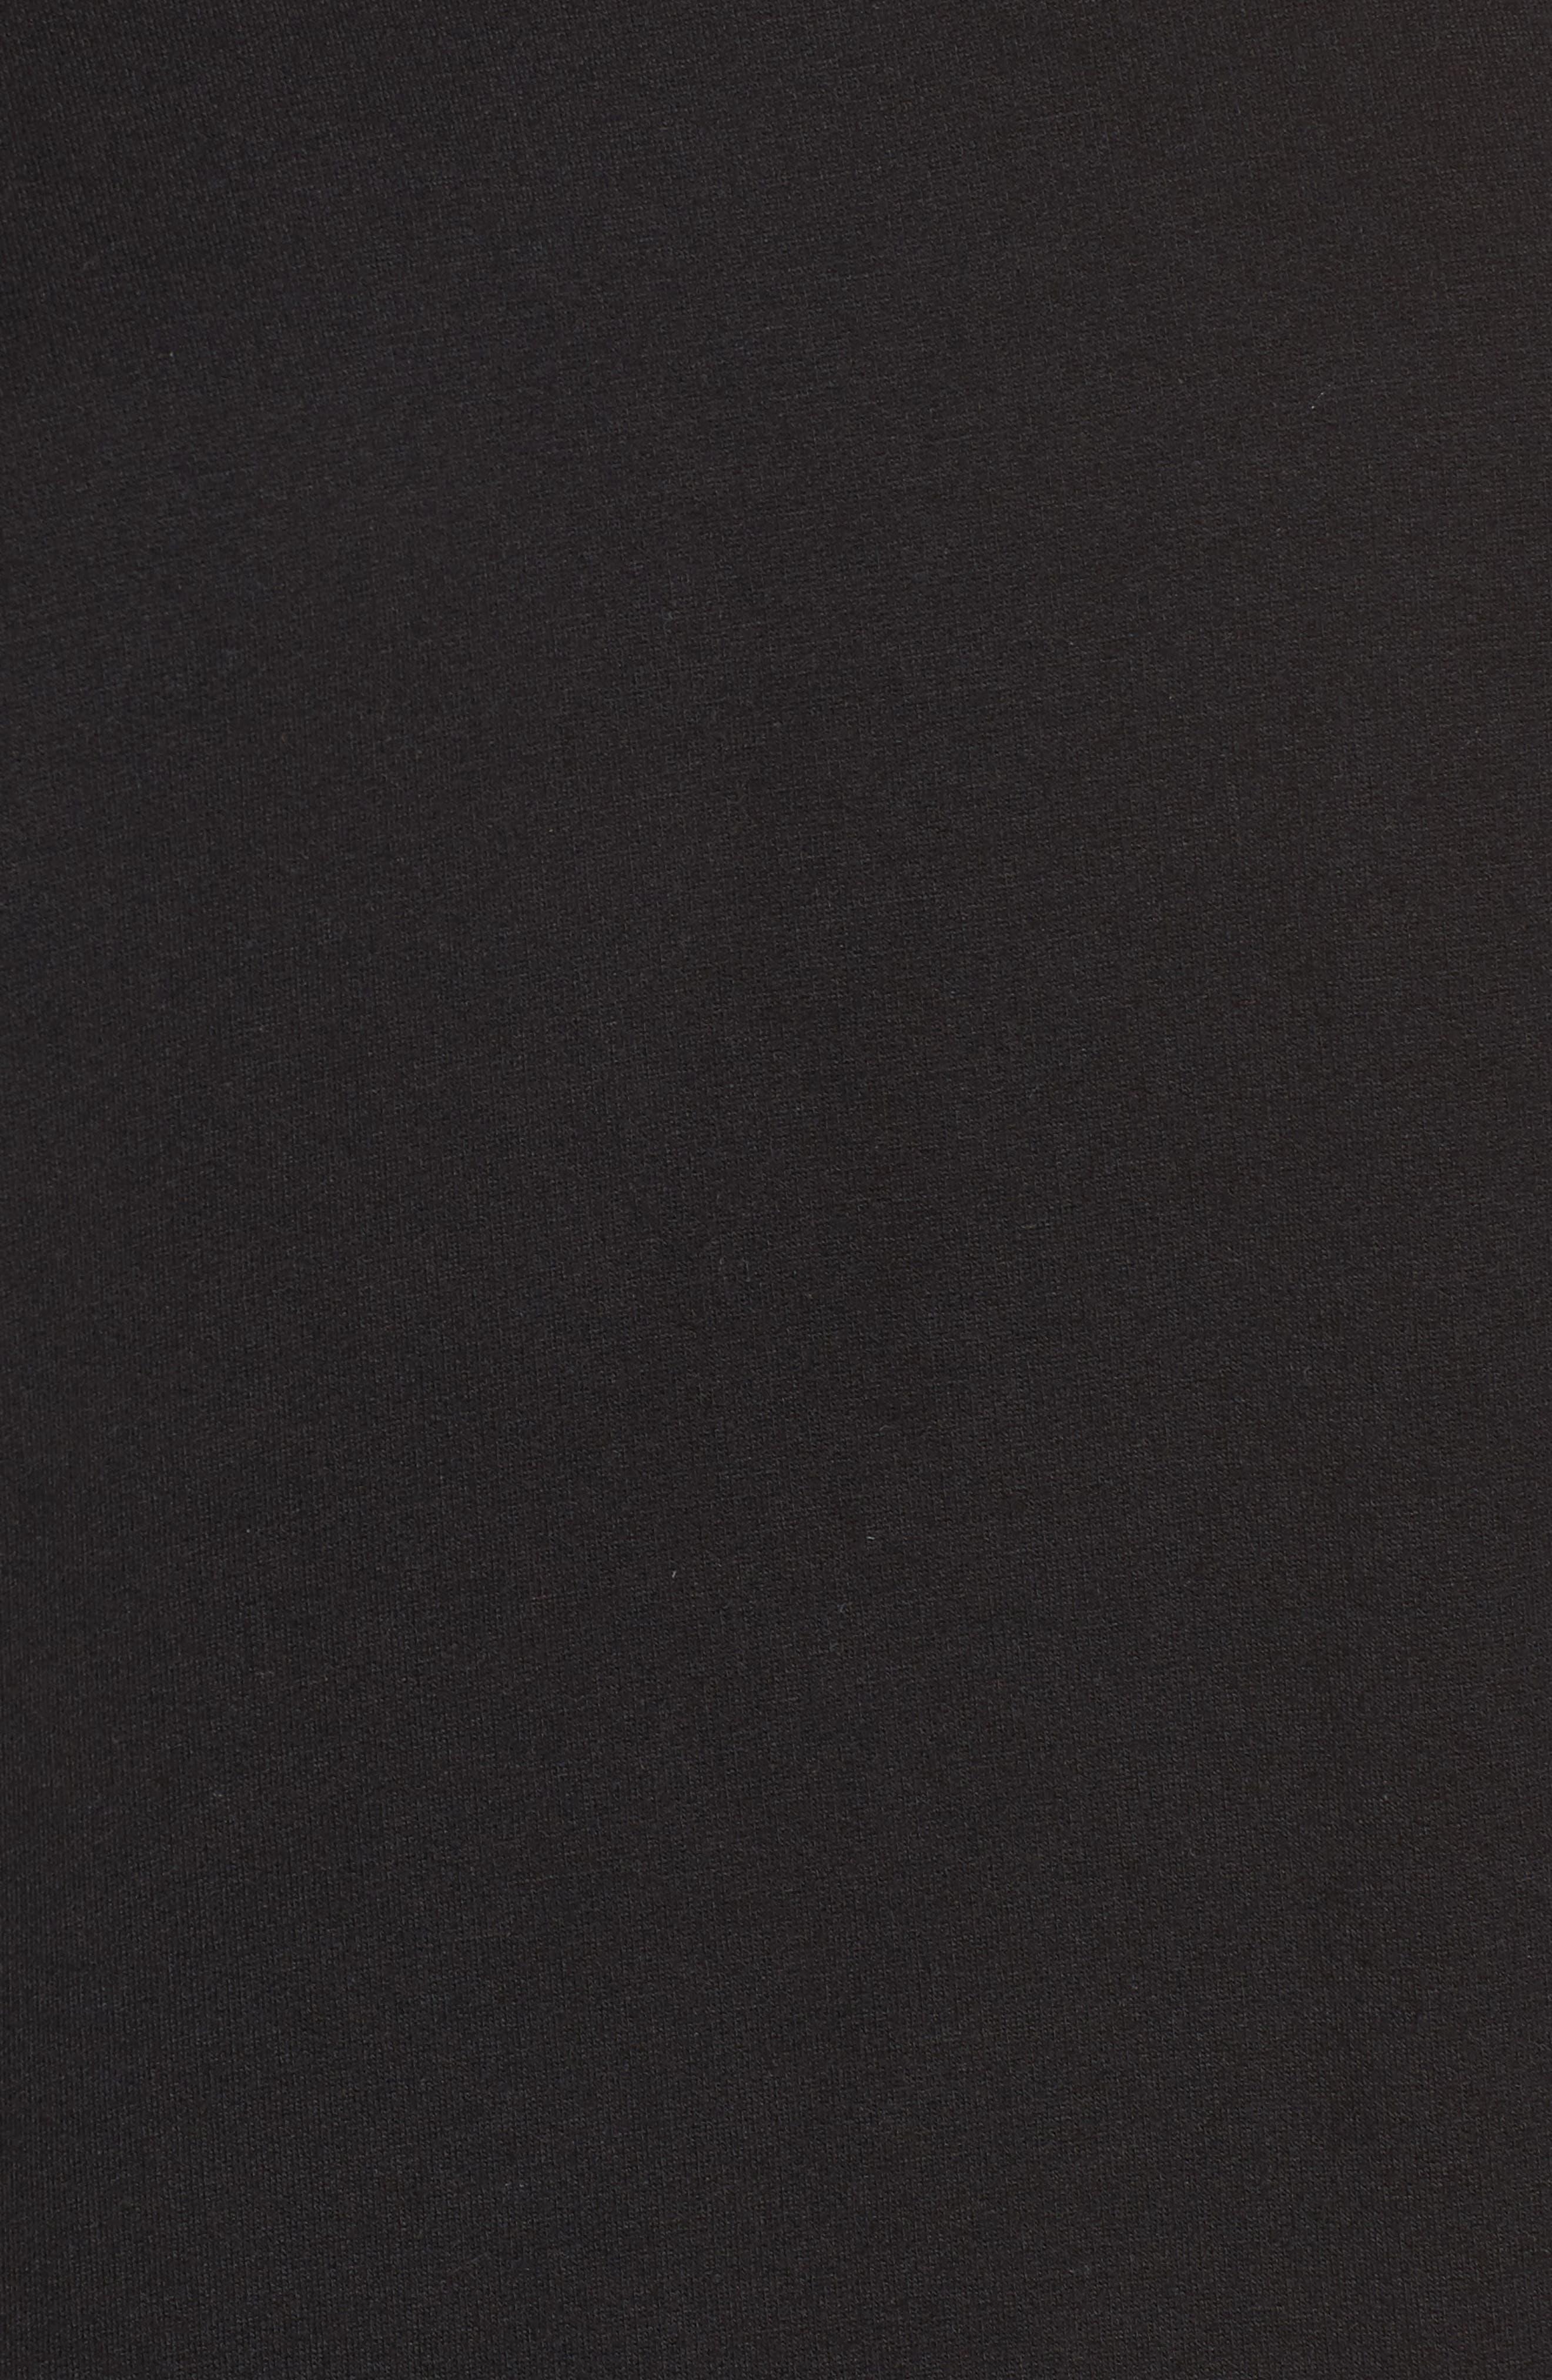 Stripe Trim Pullover,                             Alternate thumbnail 5, color,                             Black